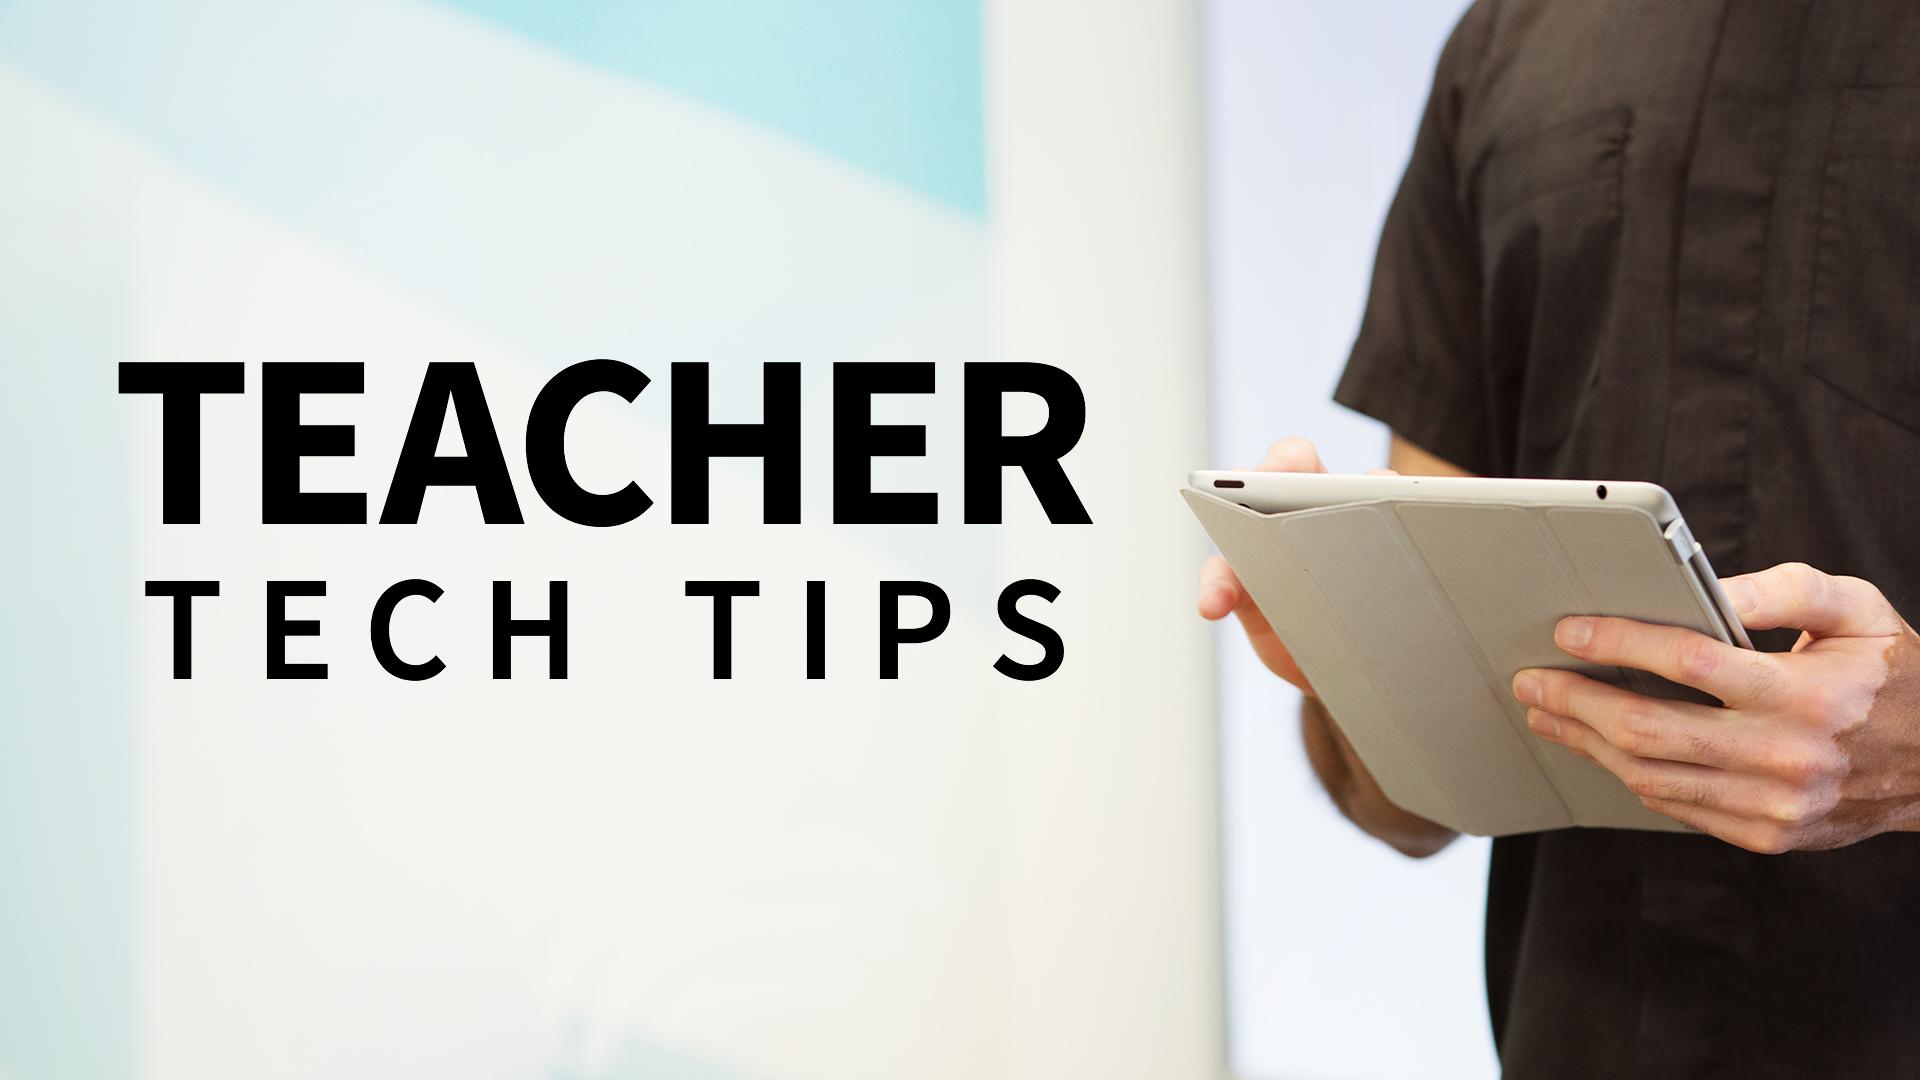 Teacher tech tips weekly sciox Choice Image